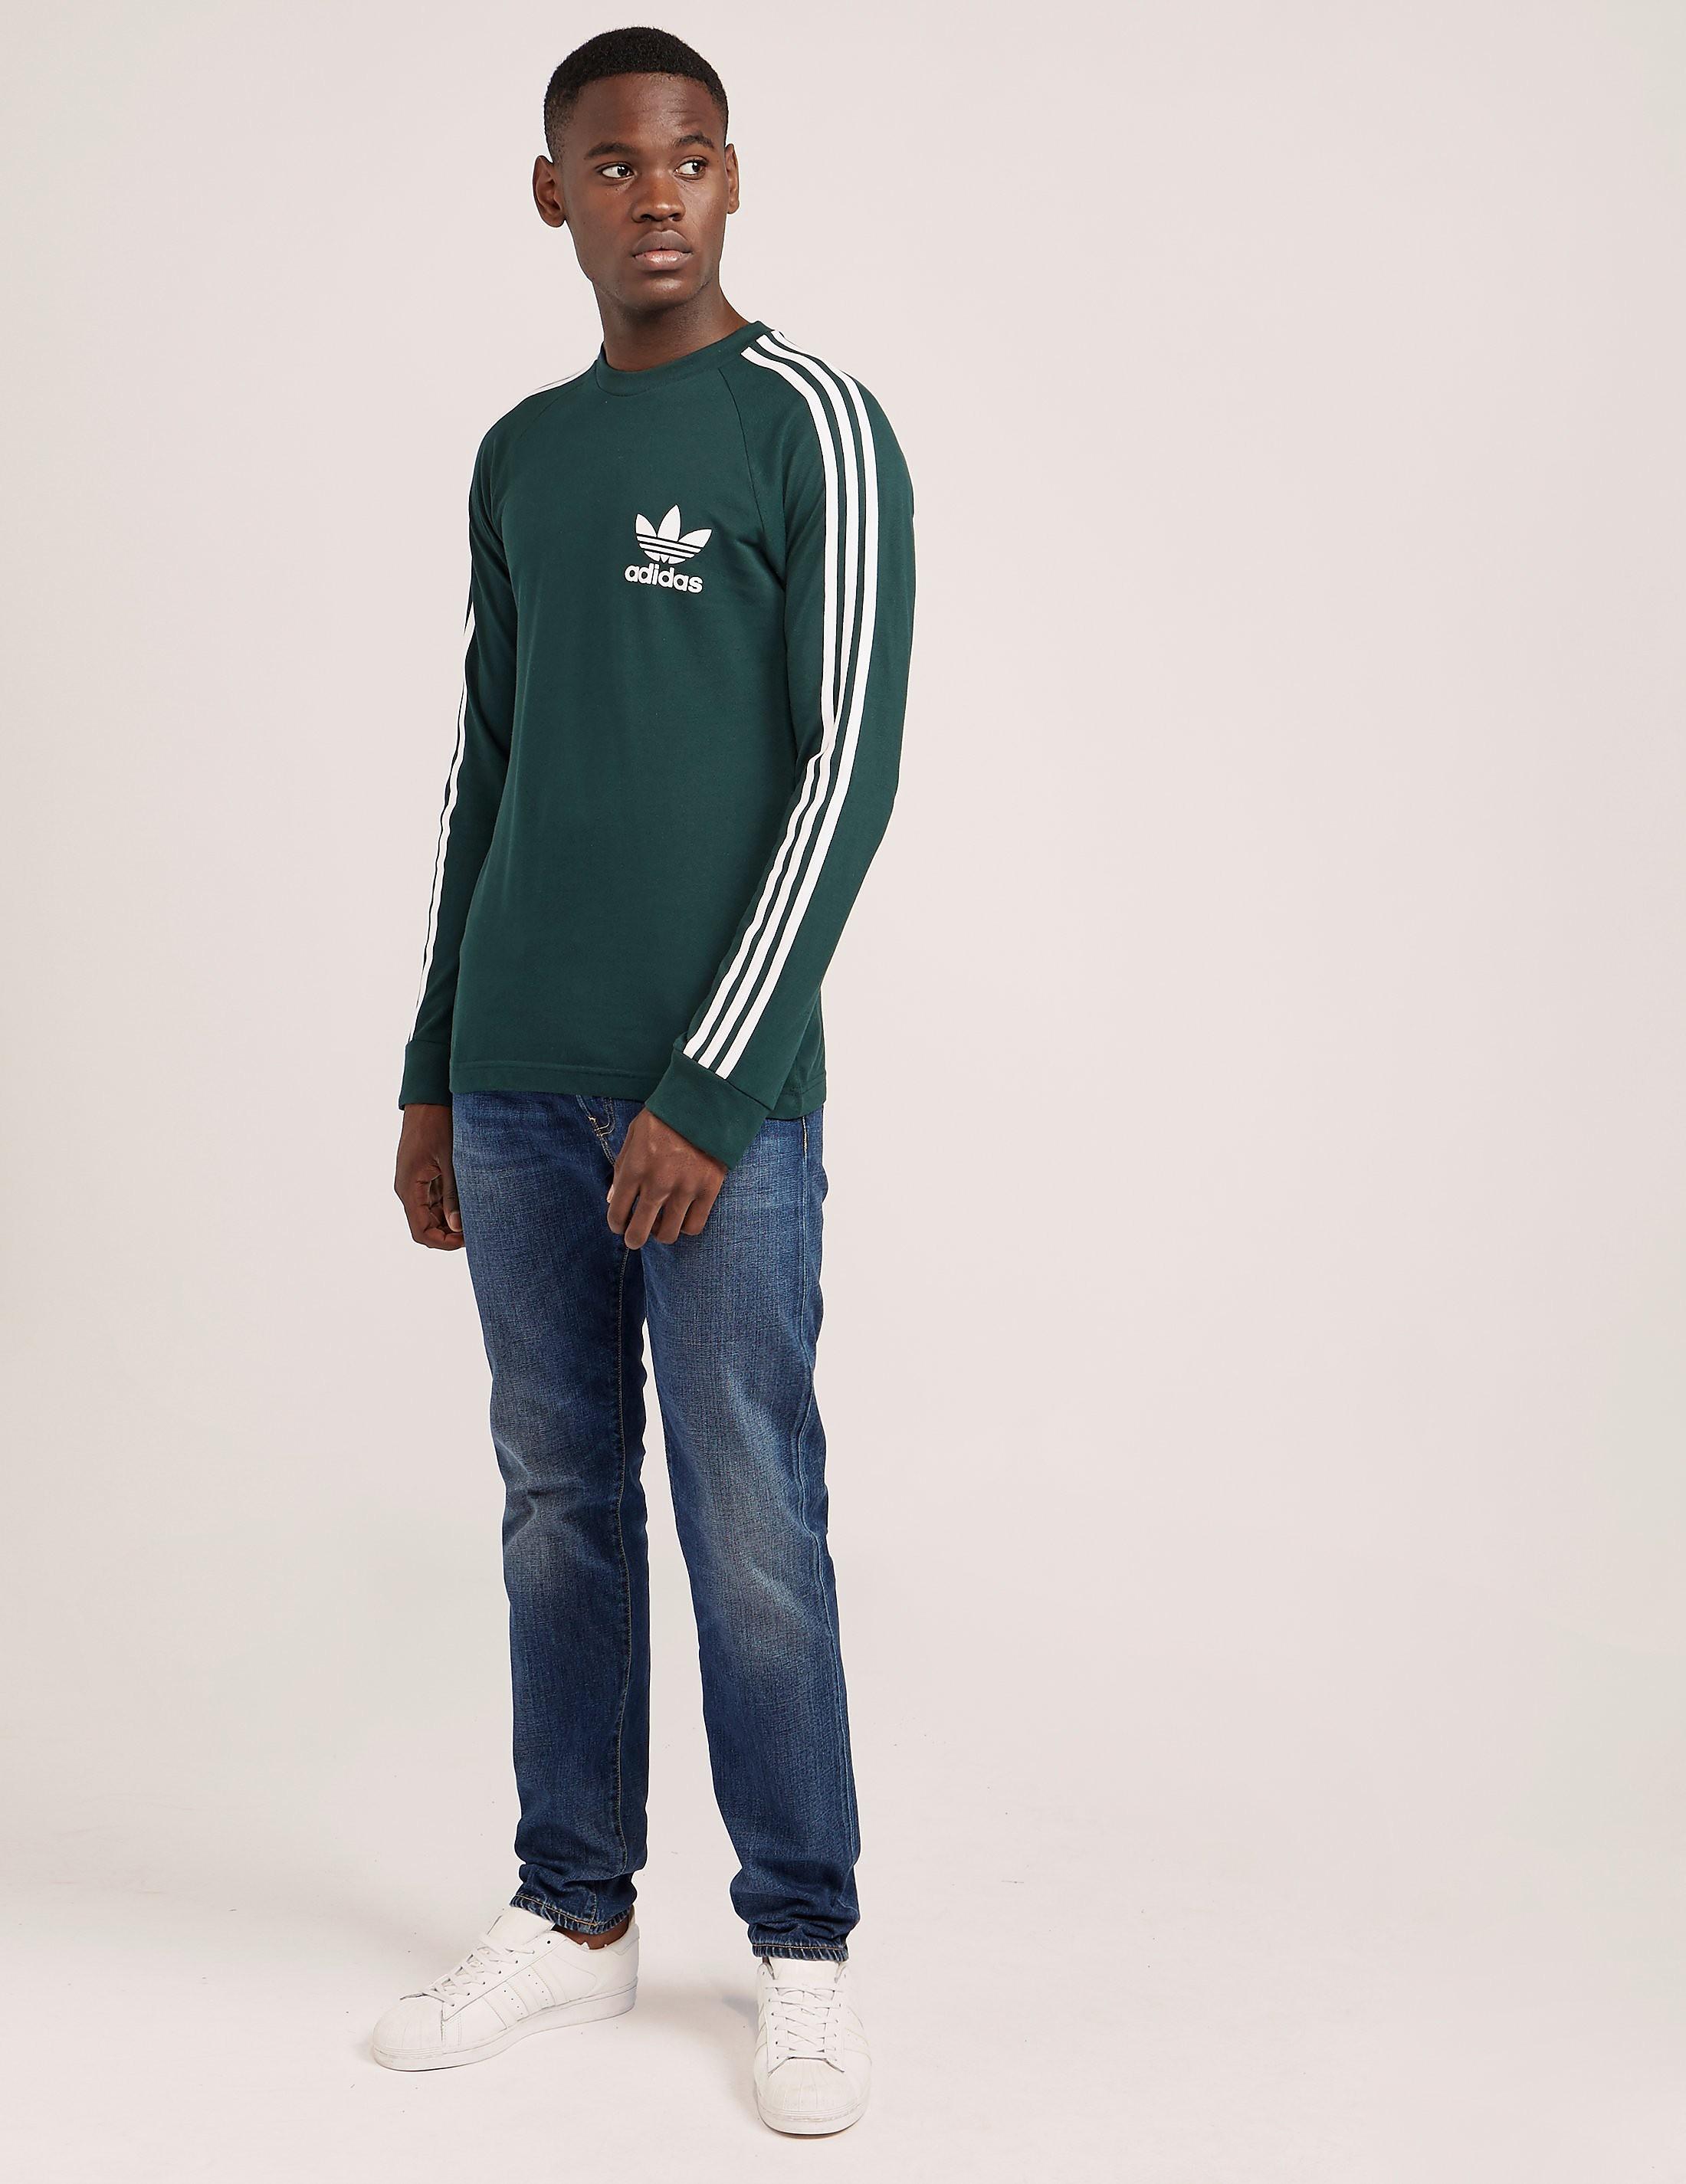 adidas Originals Long Sleeve California Pique T-Shirt